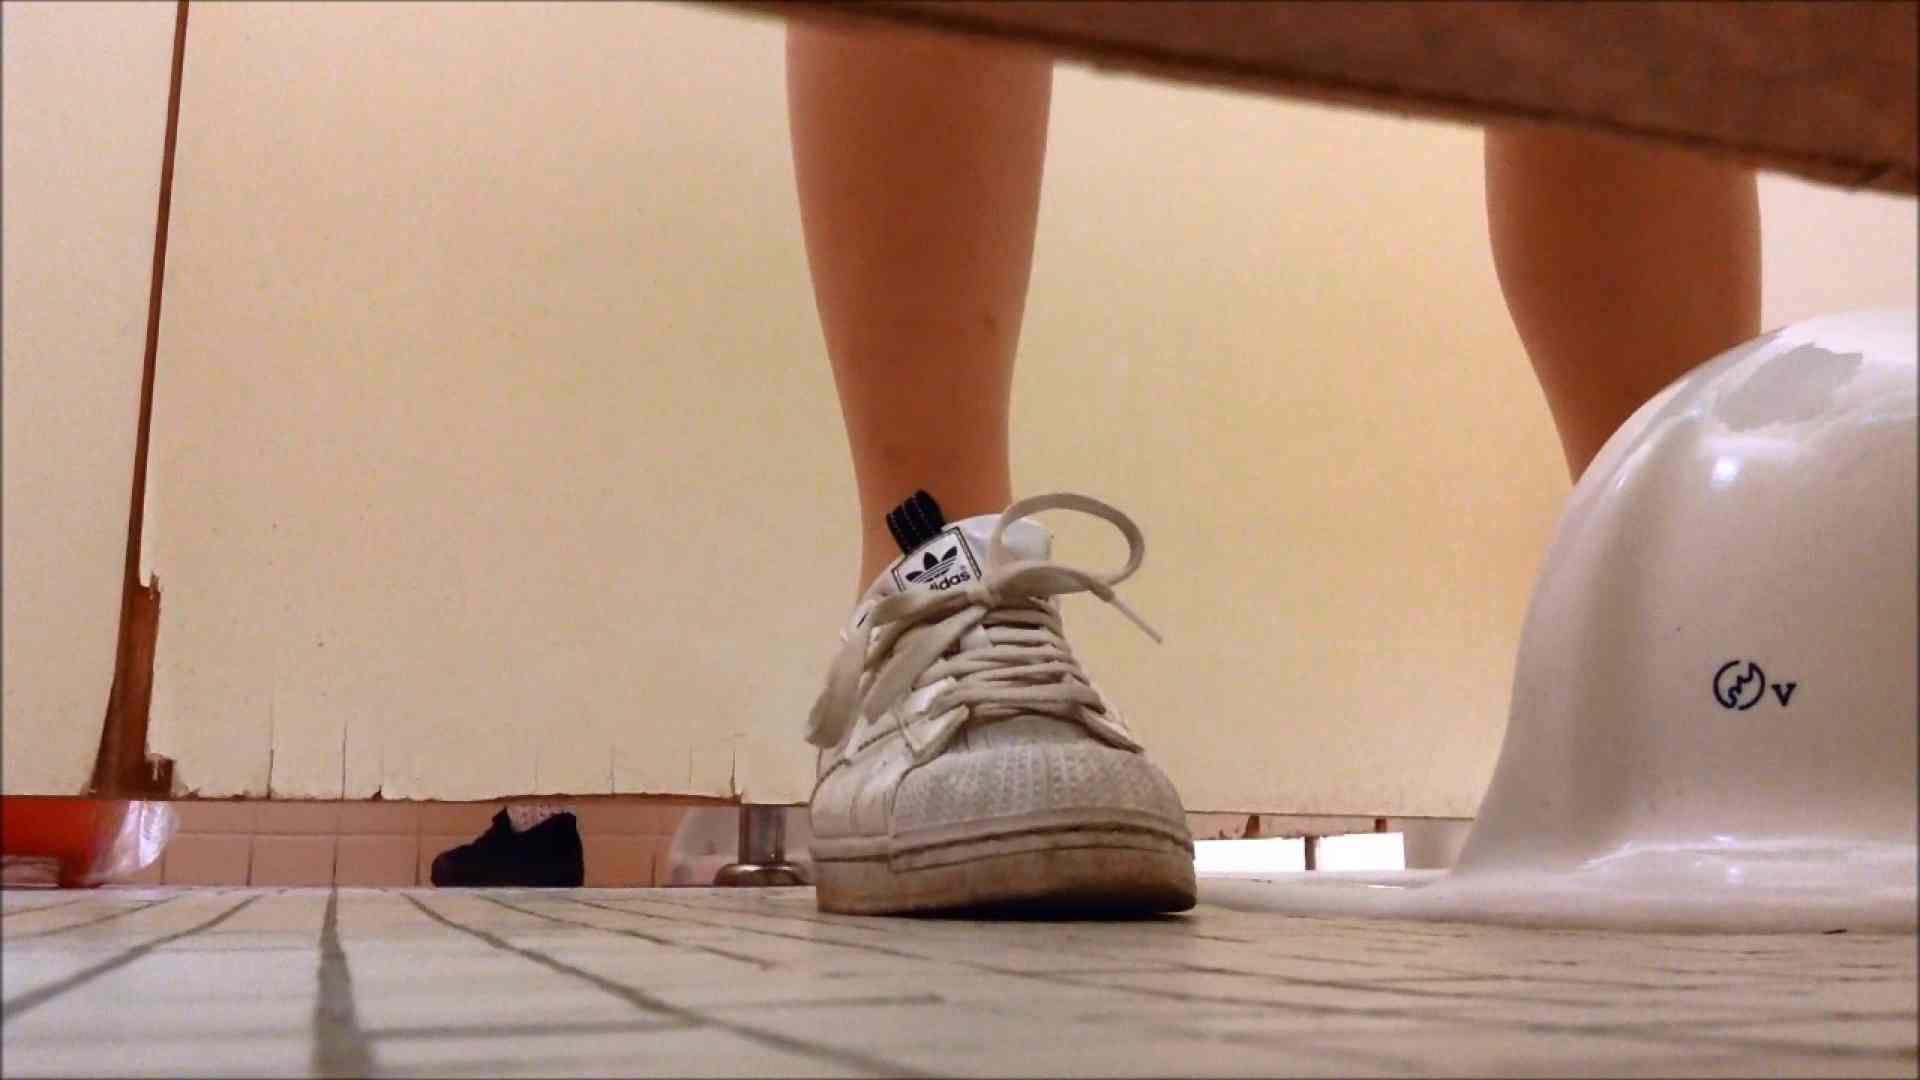 某有名大学女性洗面所 vol.16 OLのエロ生活 オマンコ無修正動画無料 45連発 10